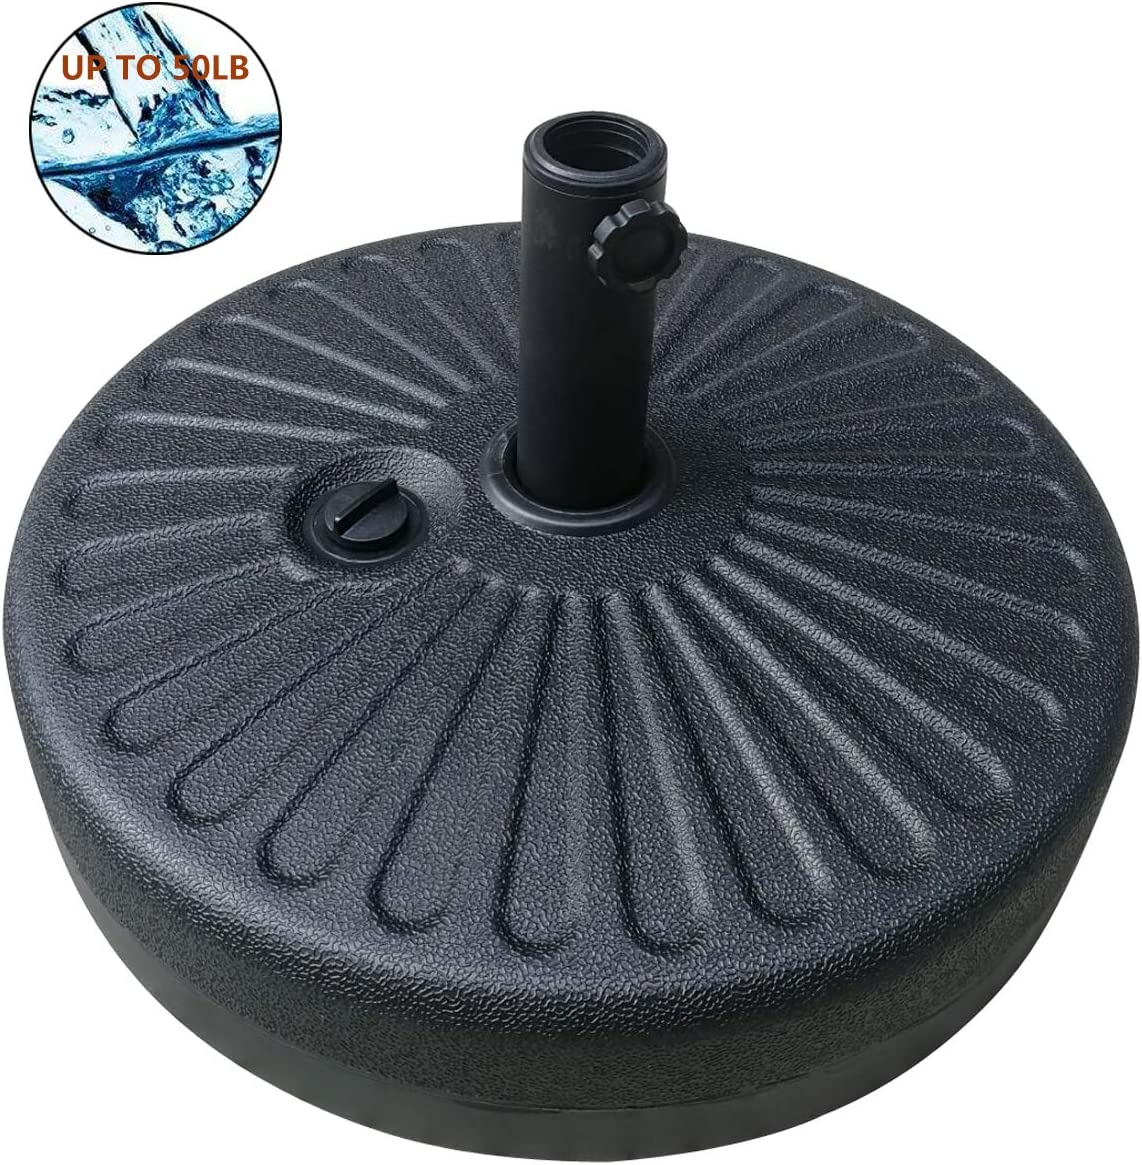 Jadada 50LB Umbrella Base Stand Water Filled Market Patio Outdoor Heavy Duty Umbrella Holder Black